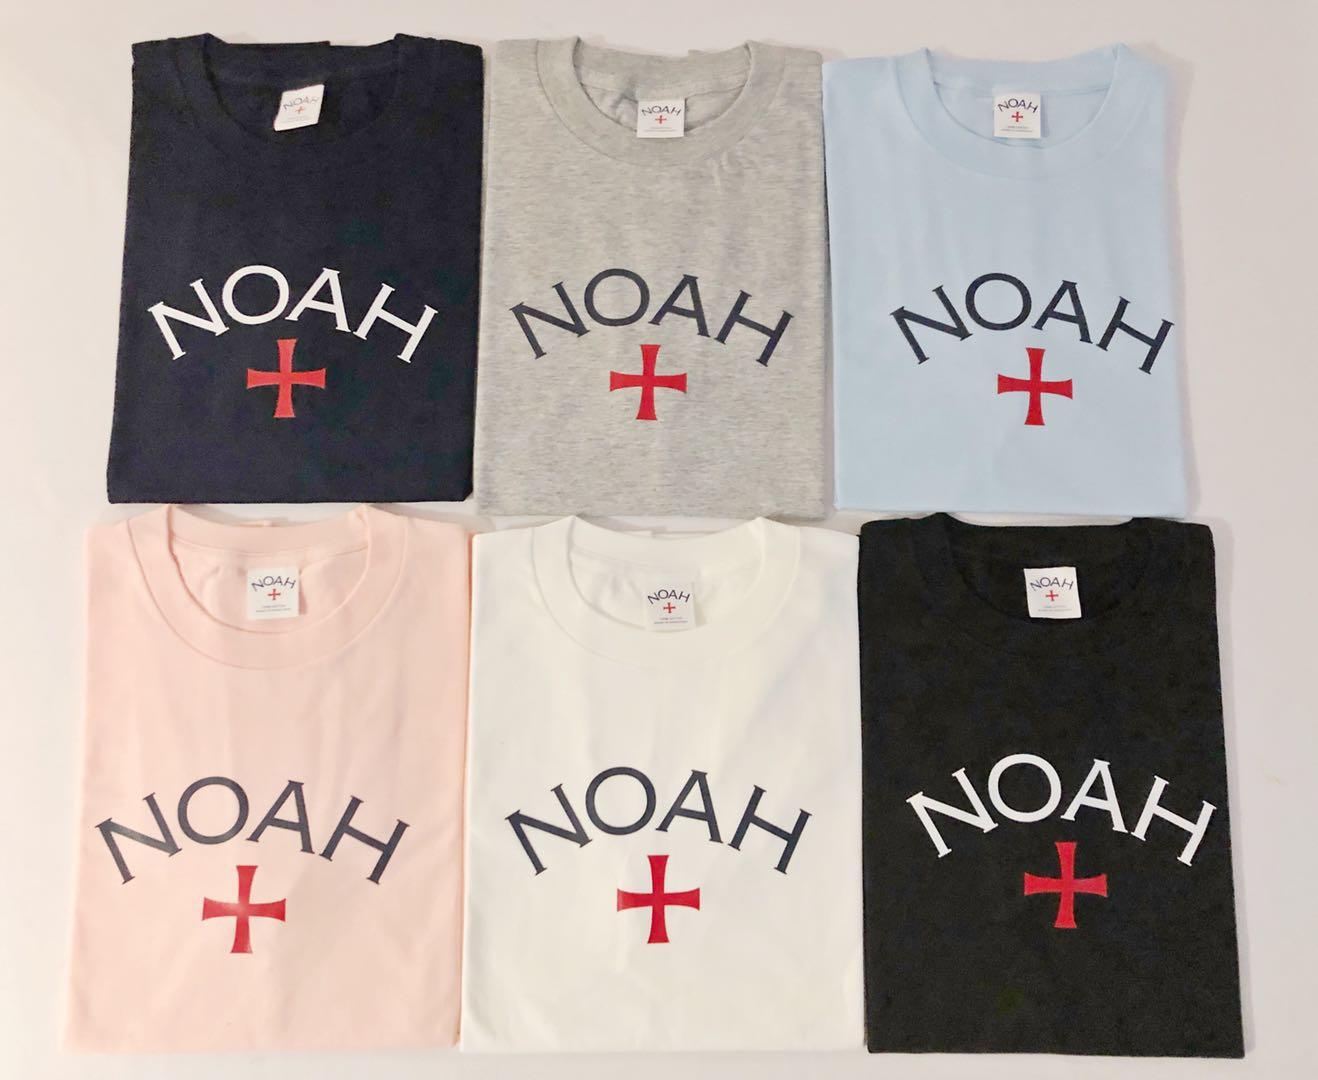 noah 元年初代远征军十字架T恤基础款tee 余文乐短袖同款 上衣